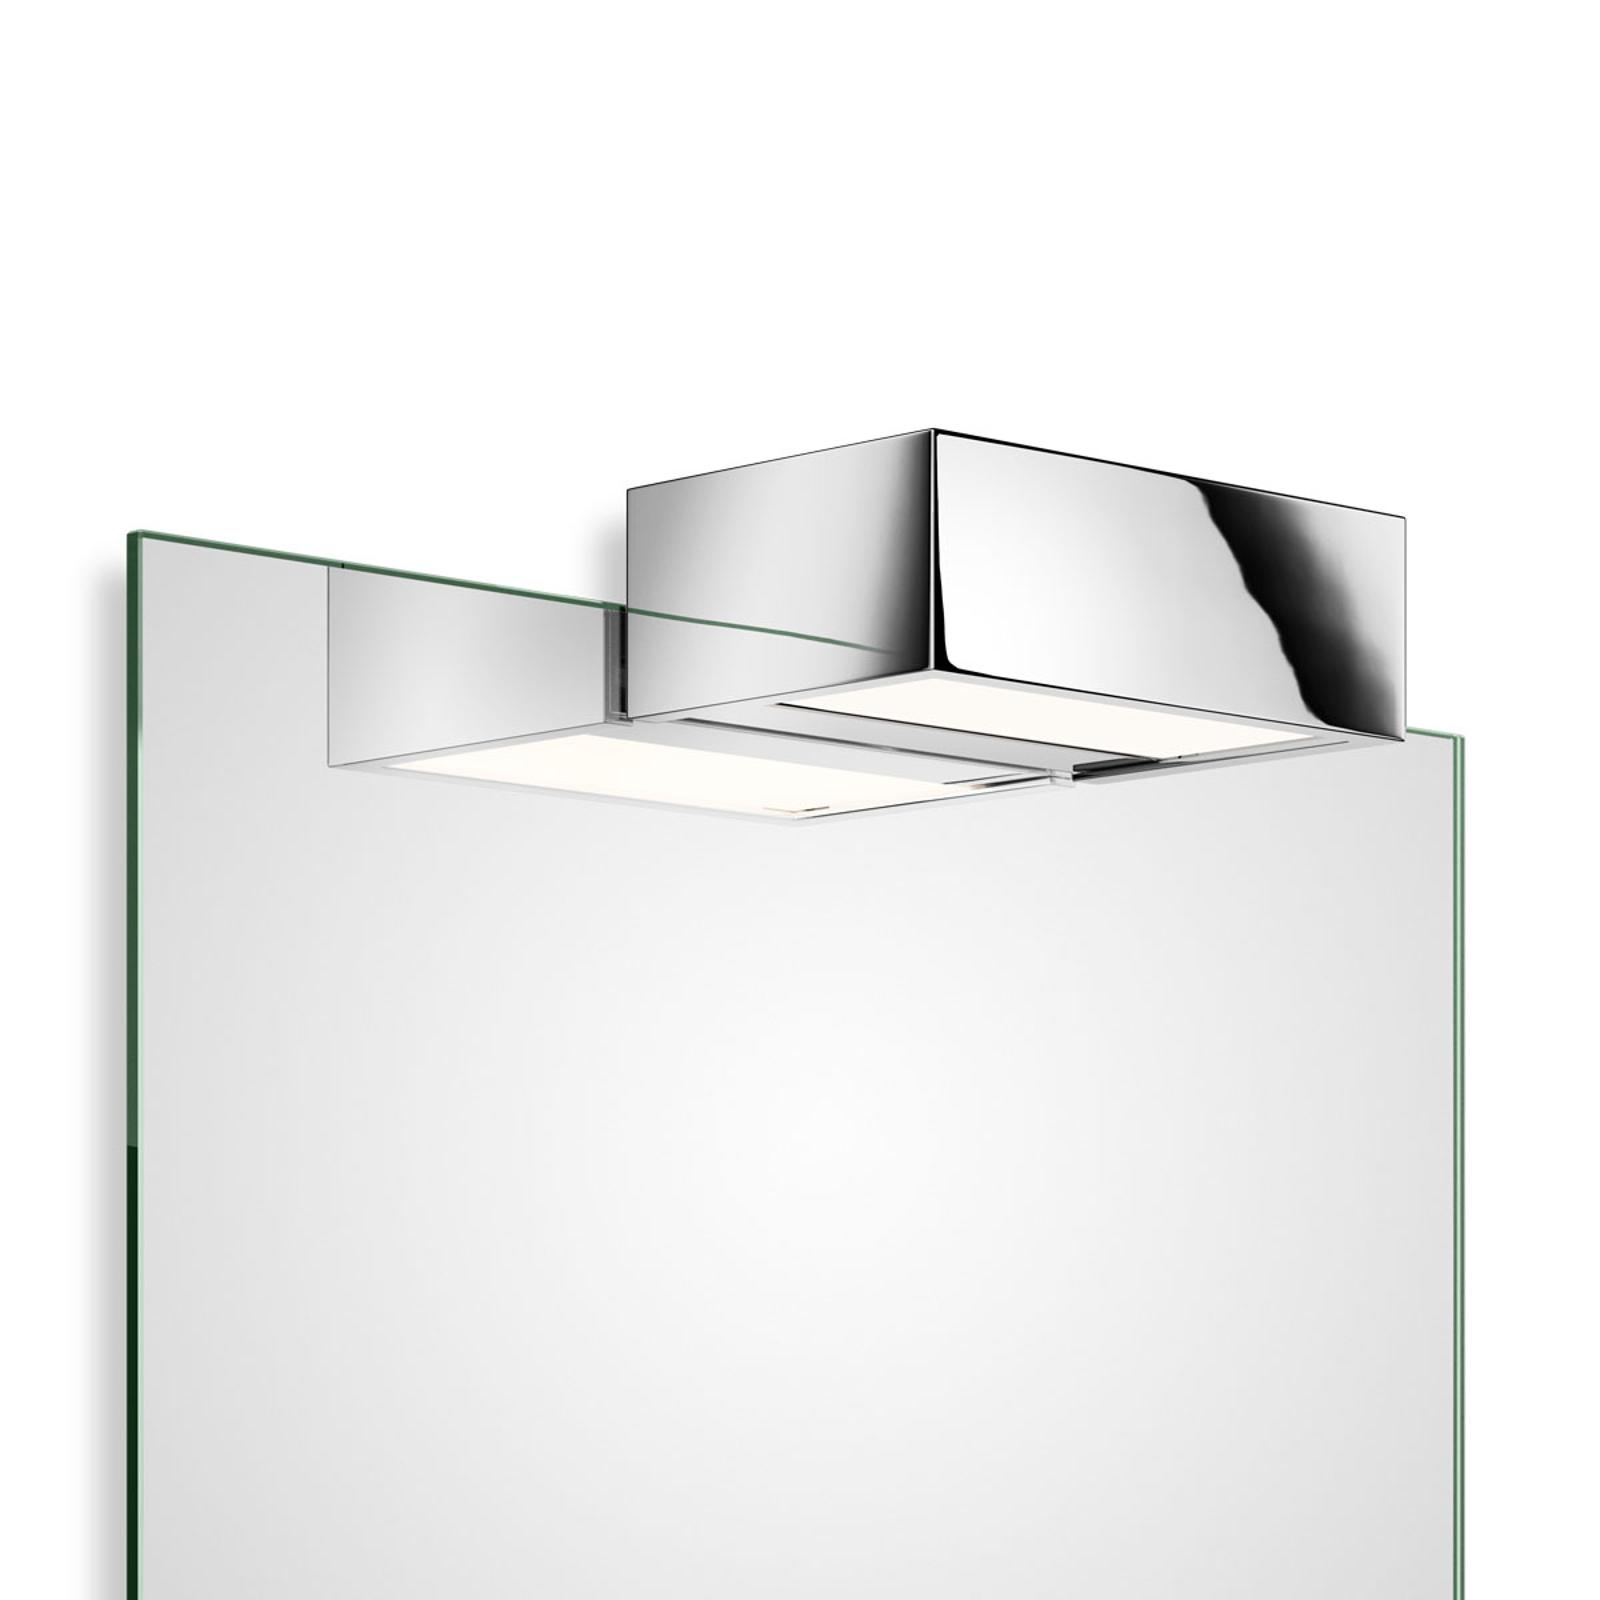 Decor Walther Box 1-15 N LED spiegellamp 3.000 K